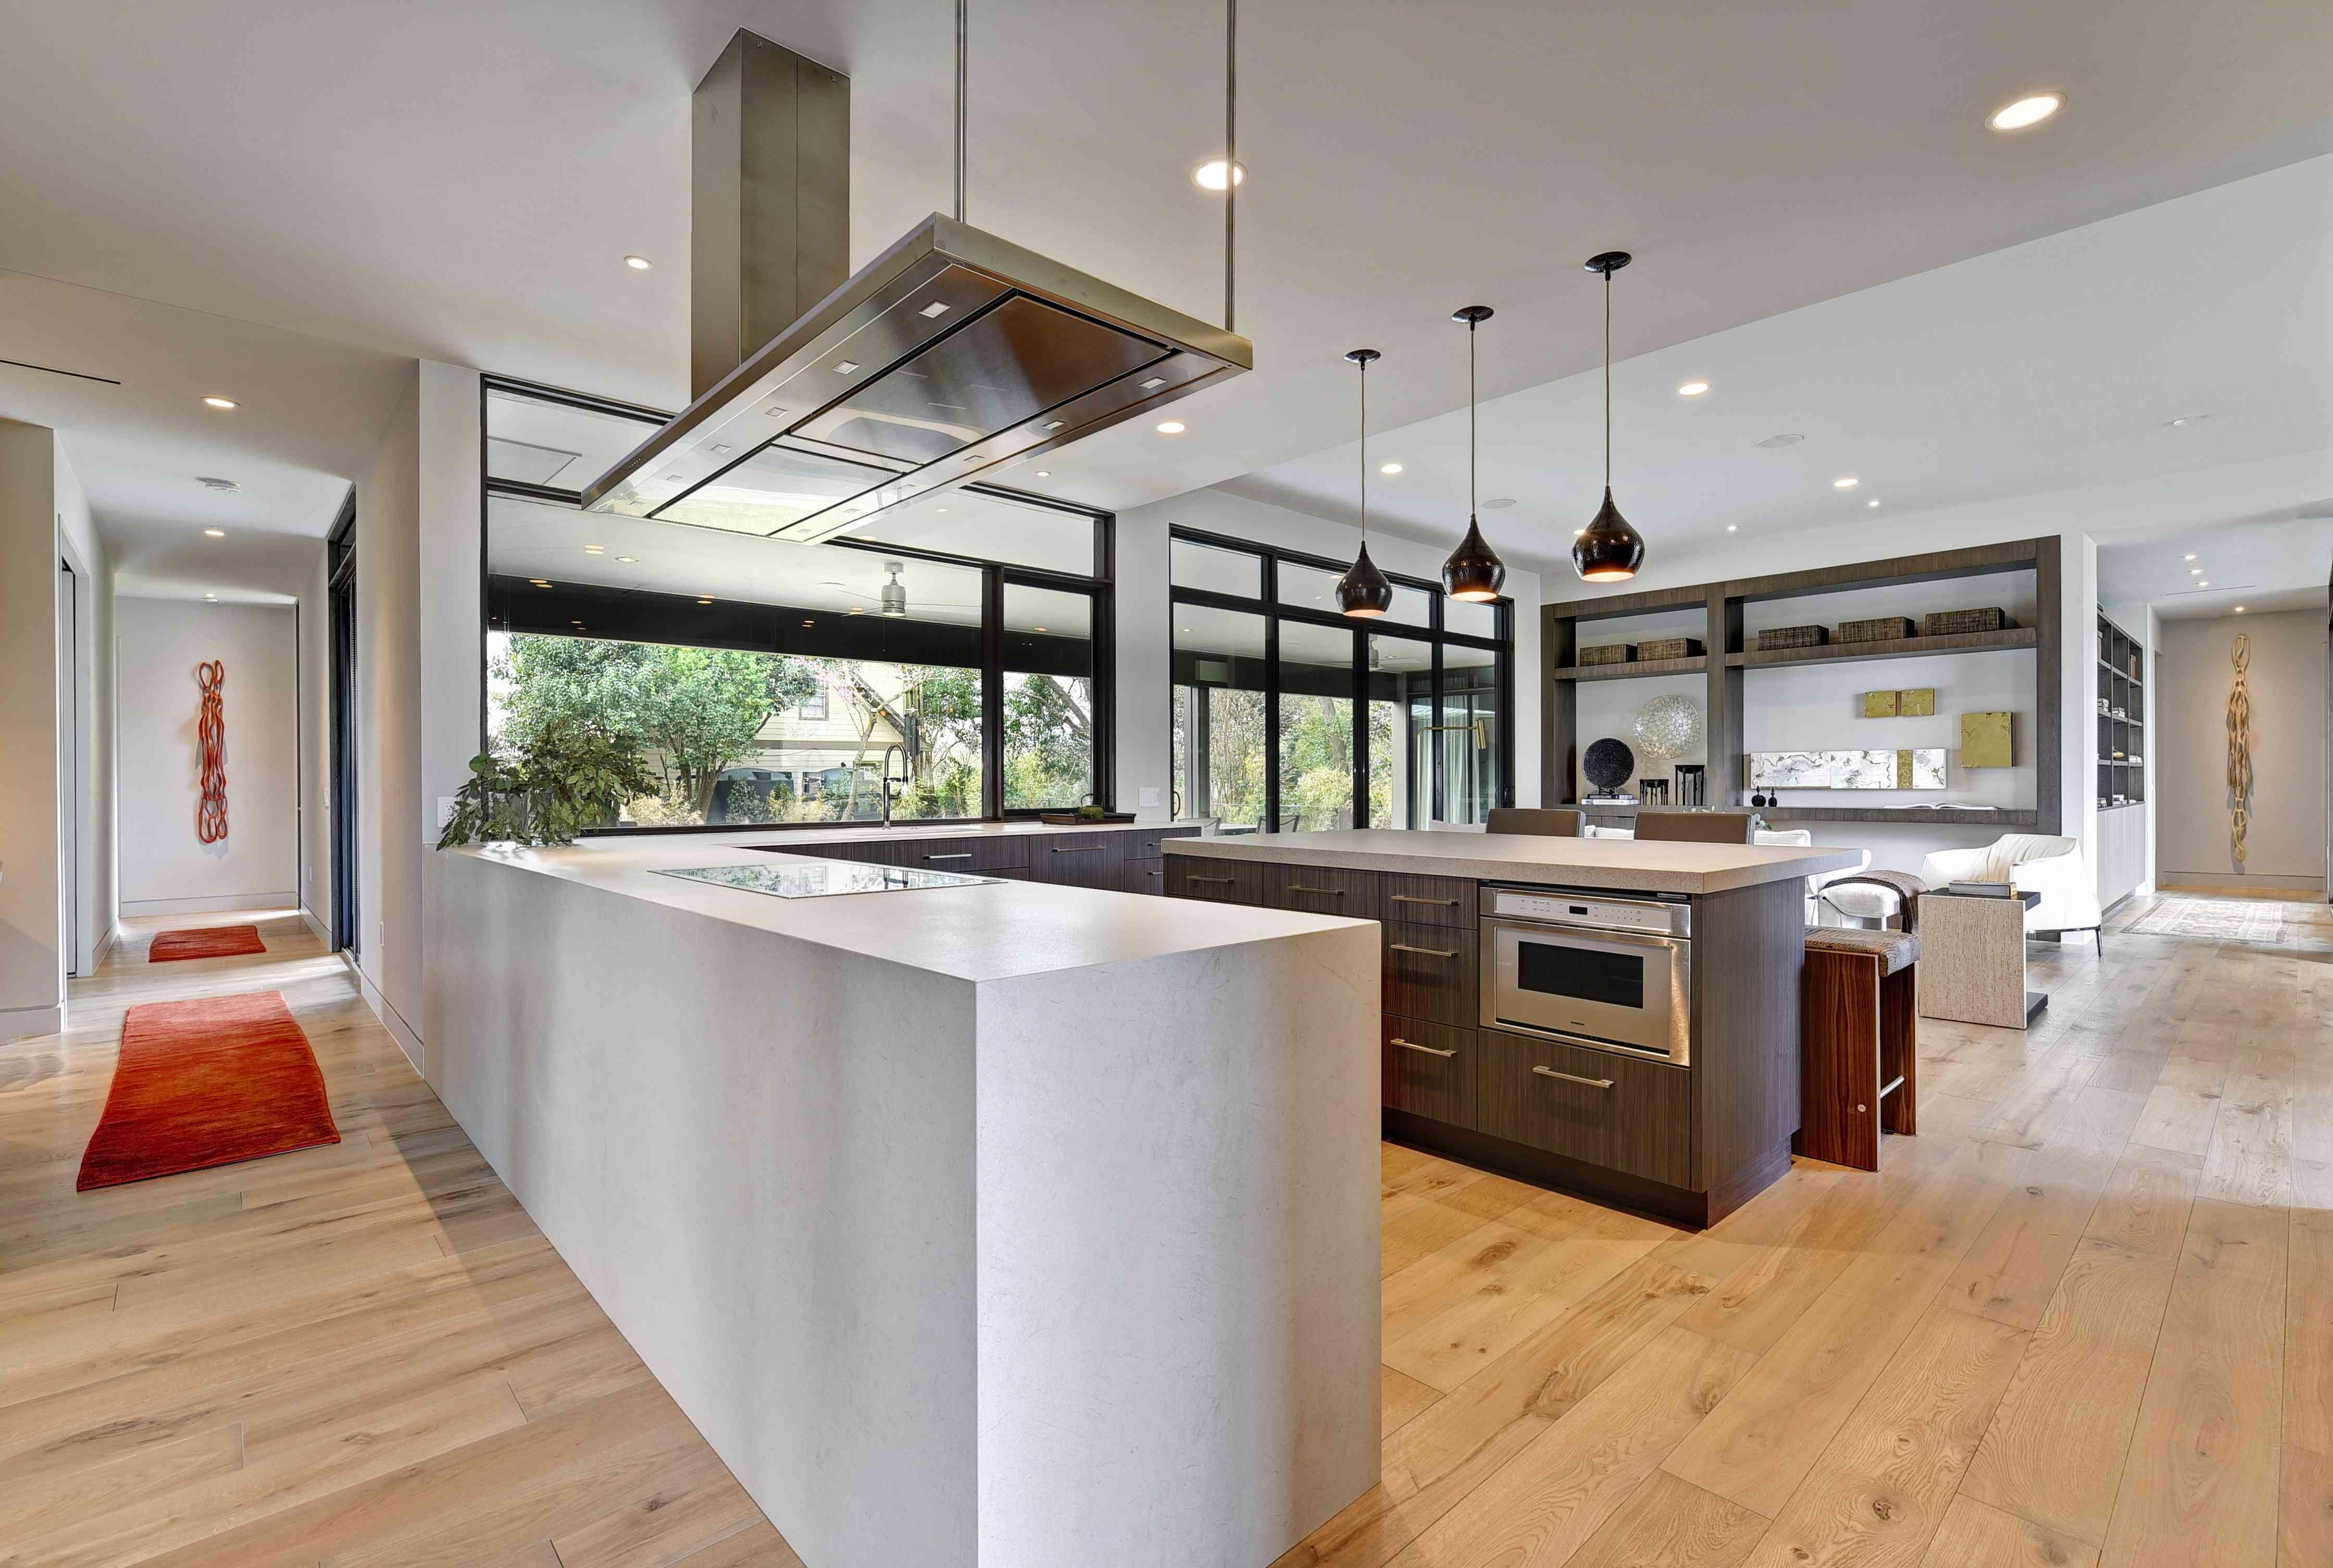 Laura Britt's kitchen in her WELL home in Austin, for Designer Diggs